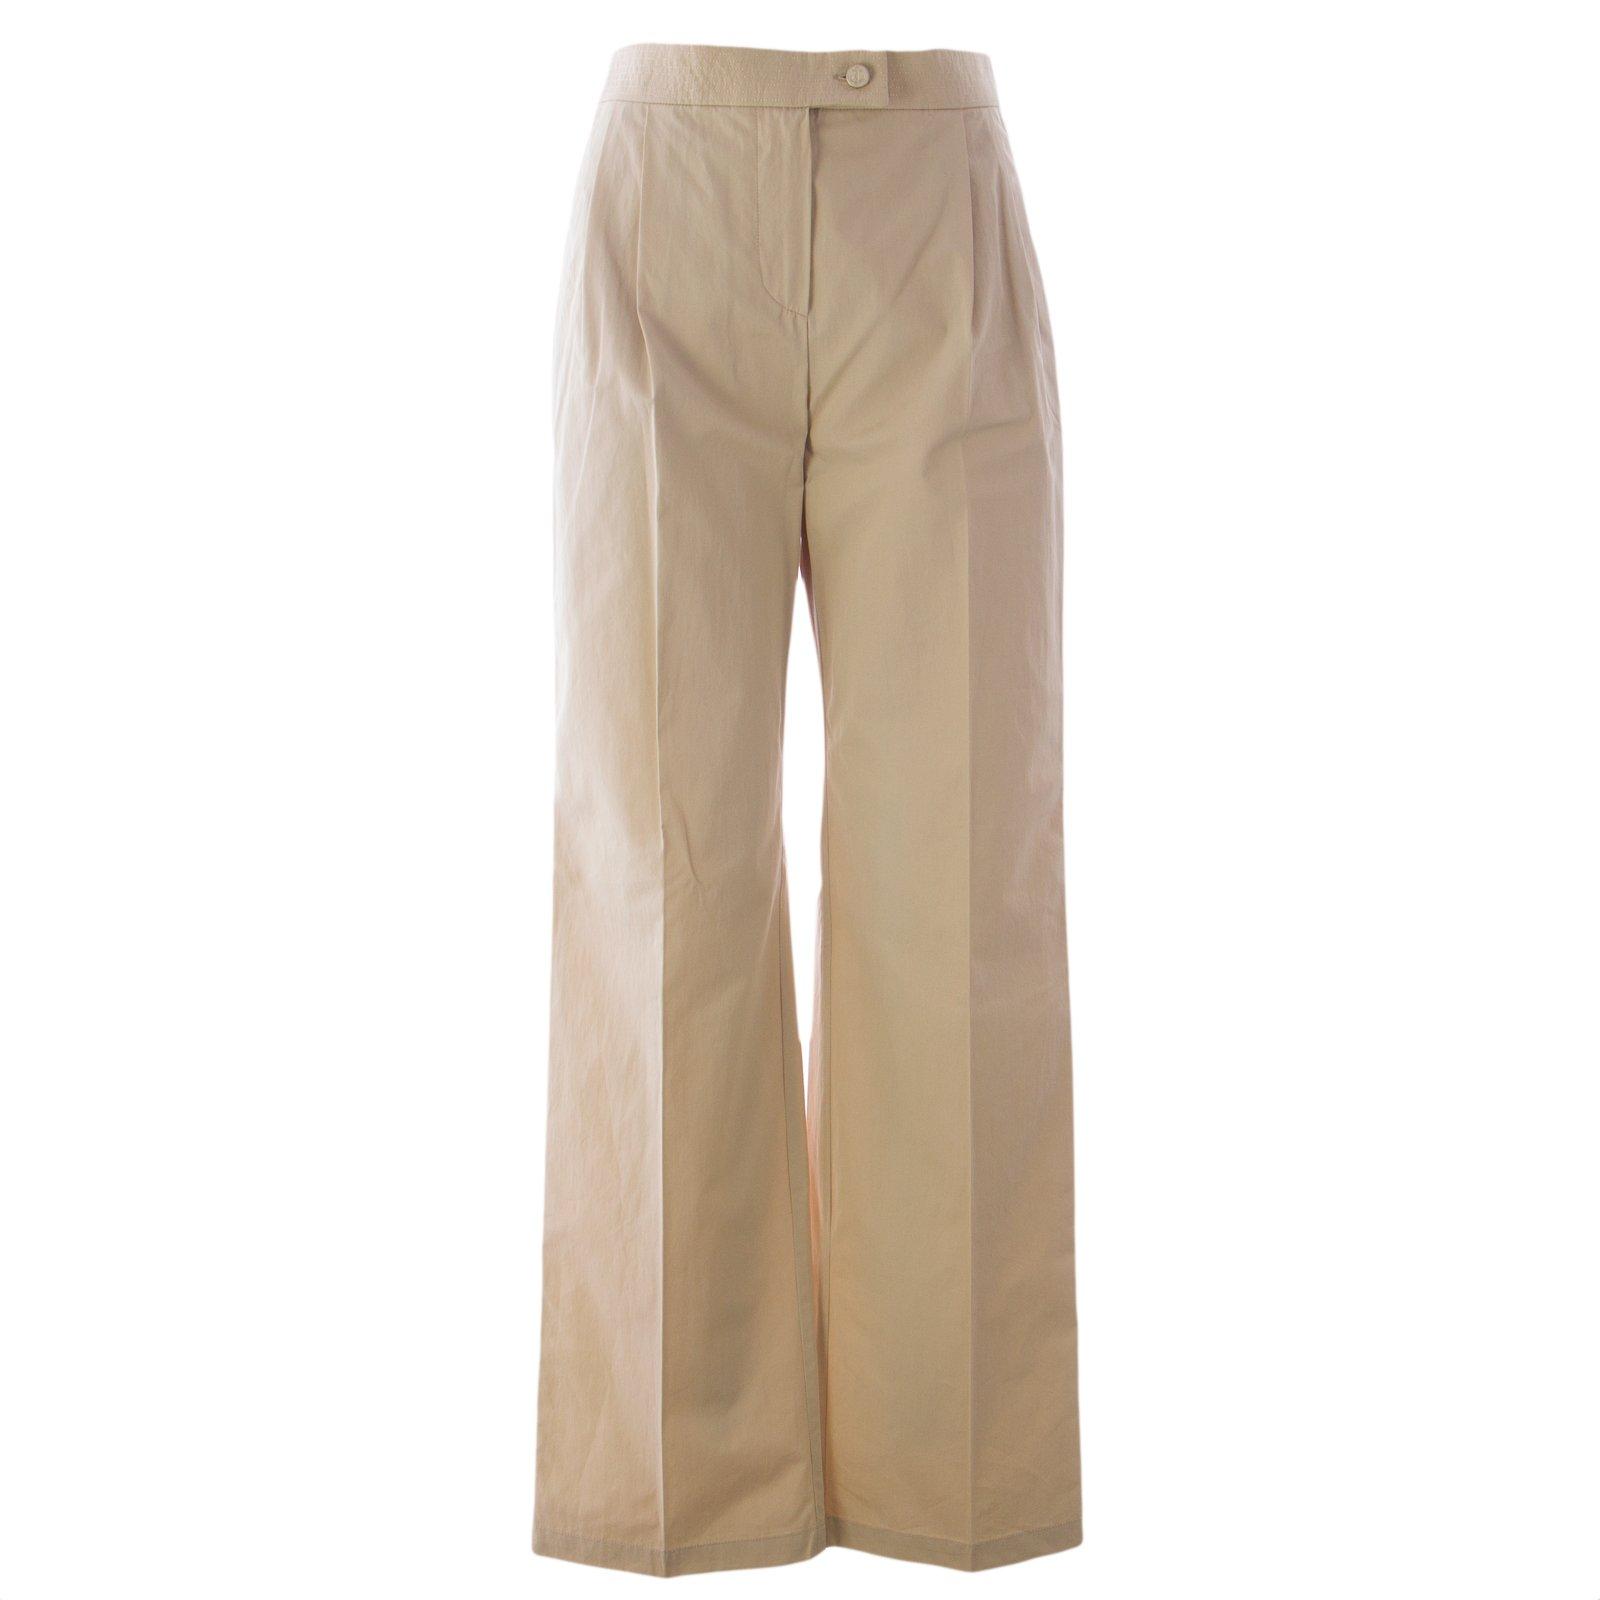 Max Mara Women's Oblio Wide Leg Trousers Sz 6 Sand